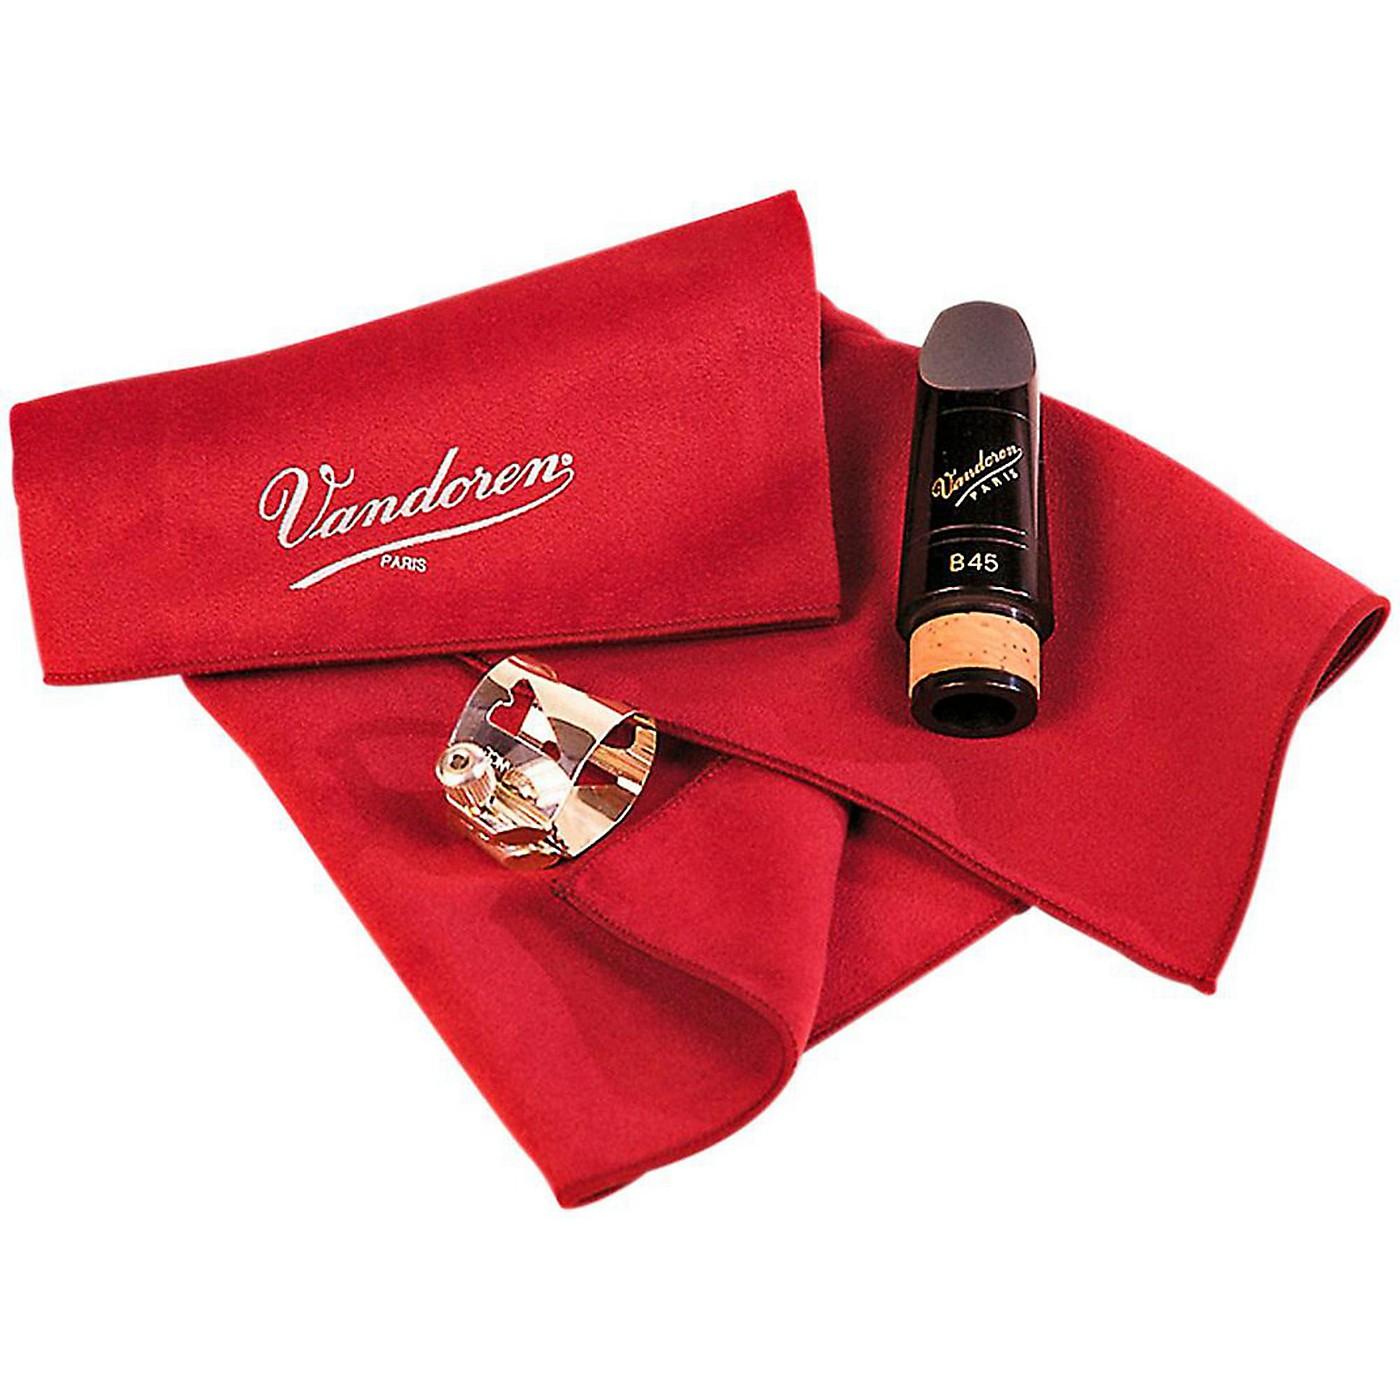 Vandoren Microfiber Cleaning Cloth thumbnail